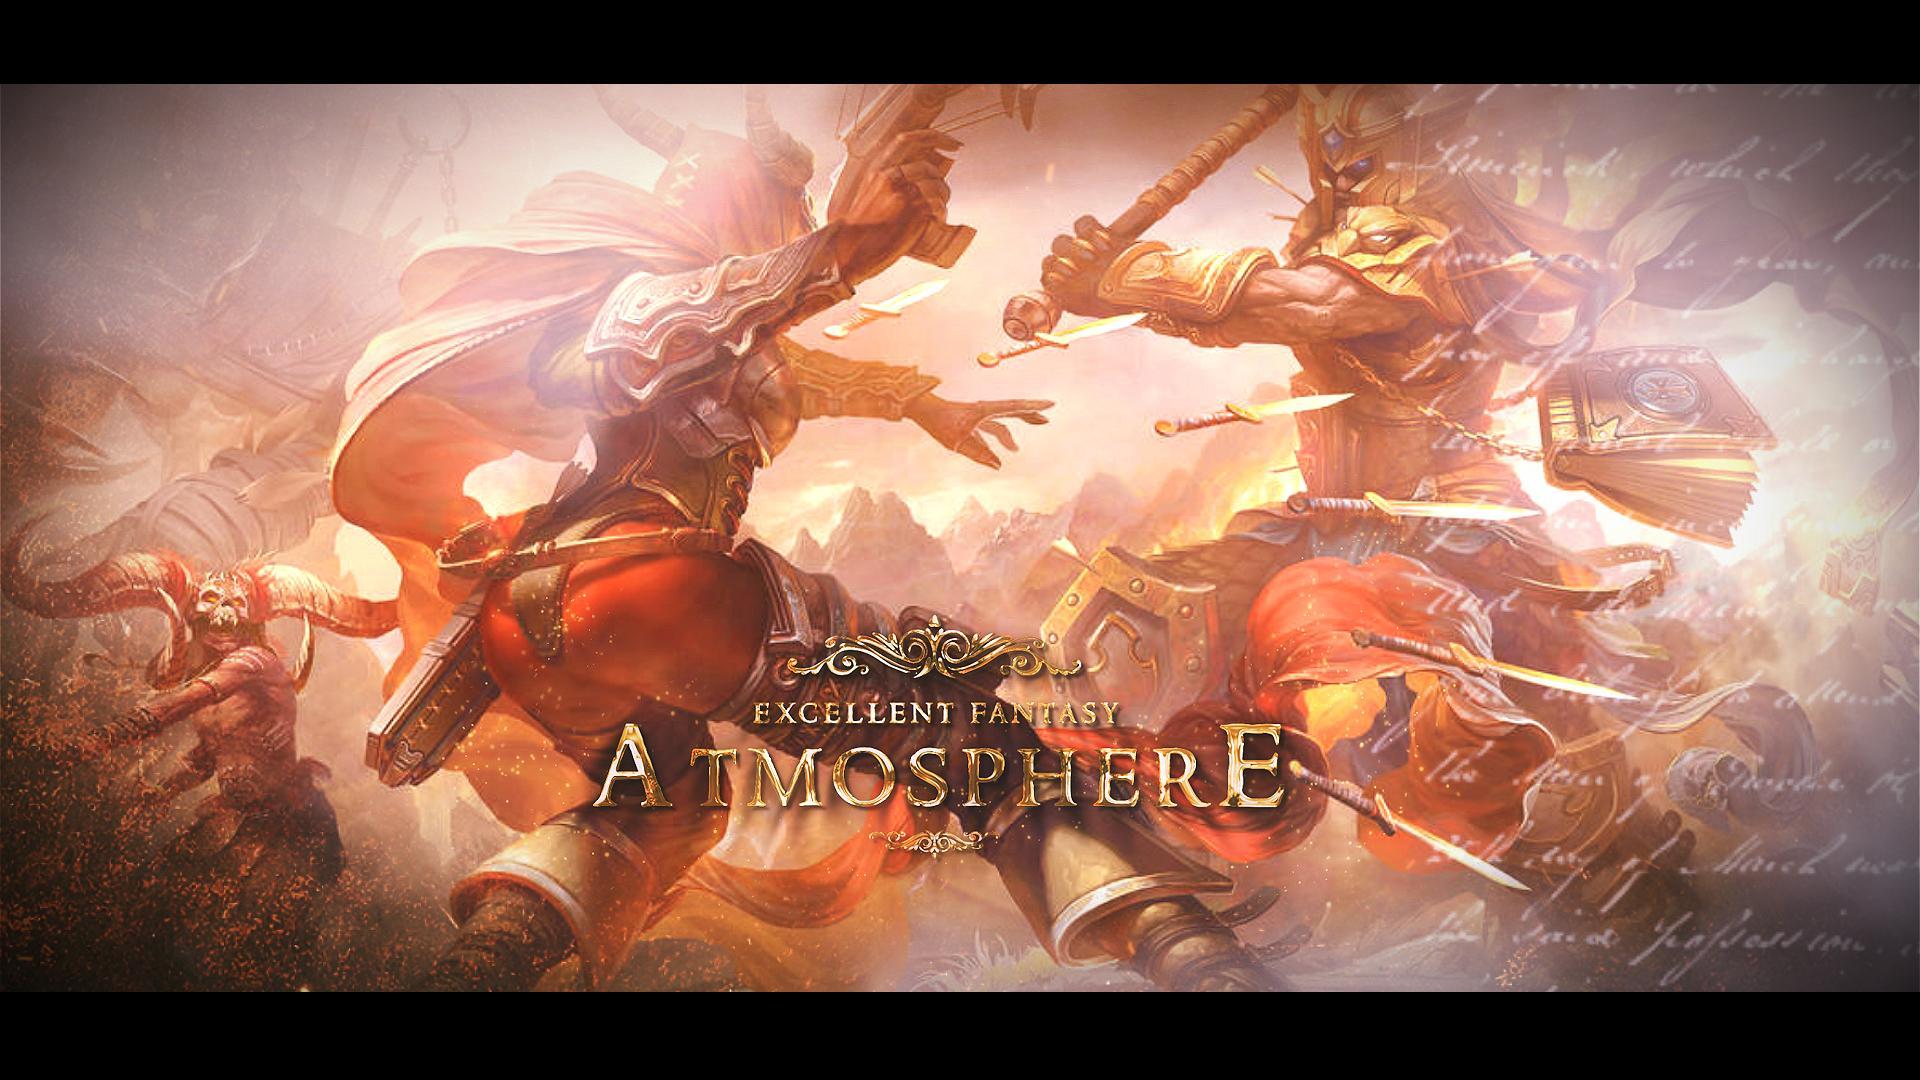 Archangel - Epic Fantasy Trailer - 8